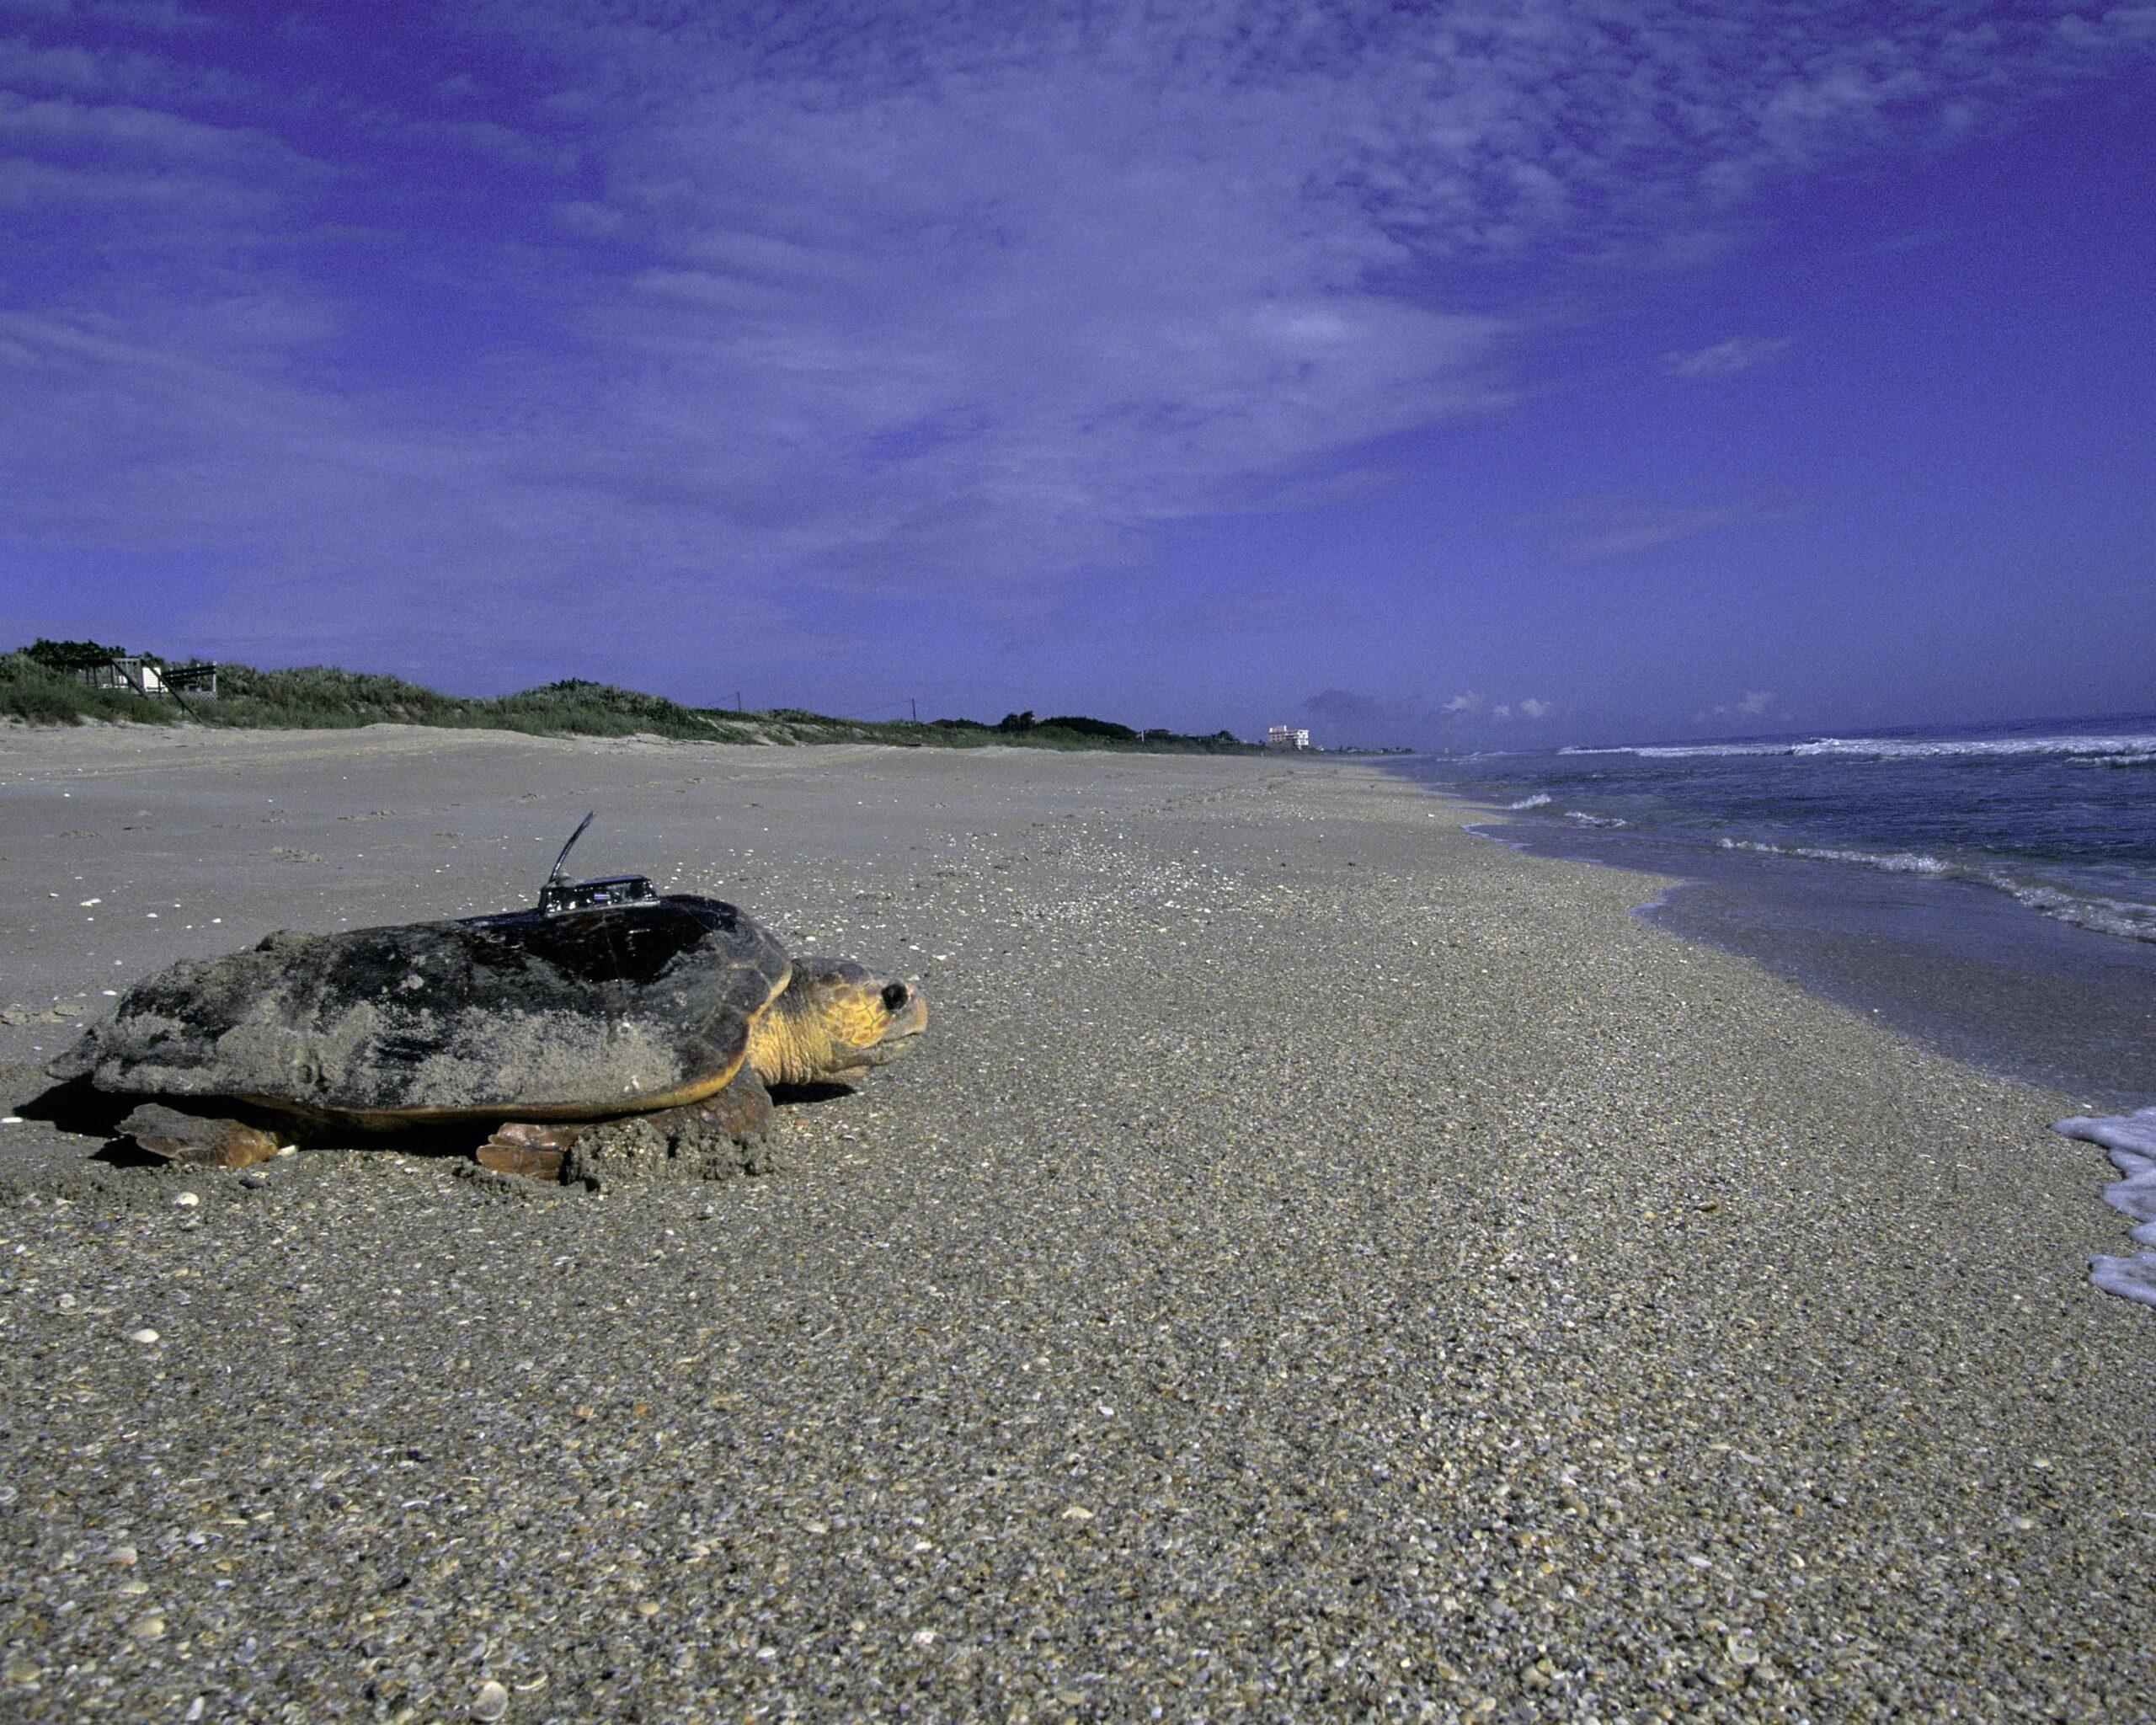 Rare Turtles Gorging on California's Jellyfish Boom